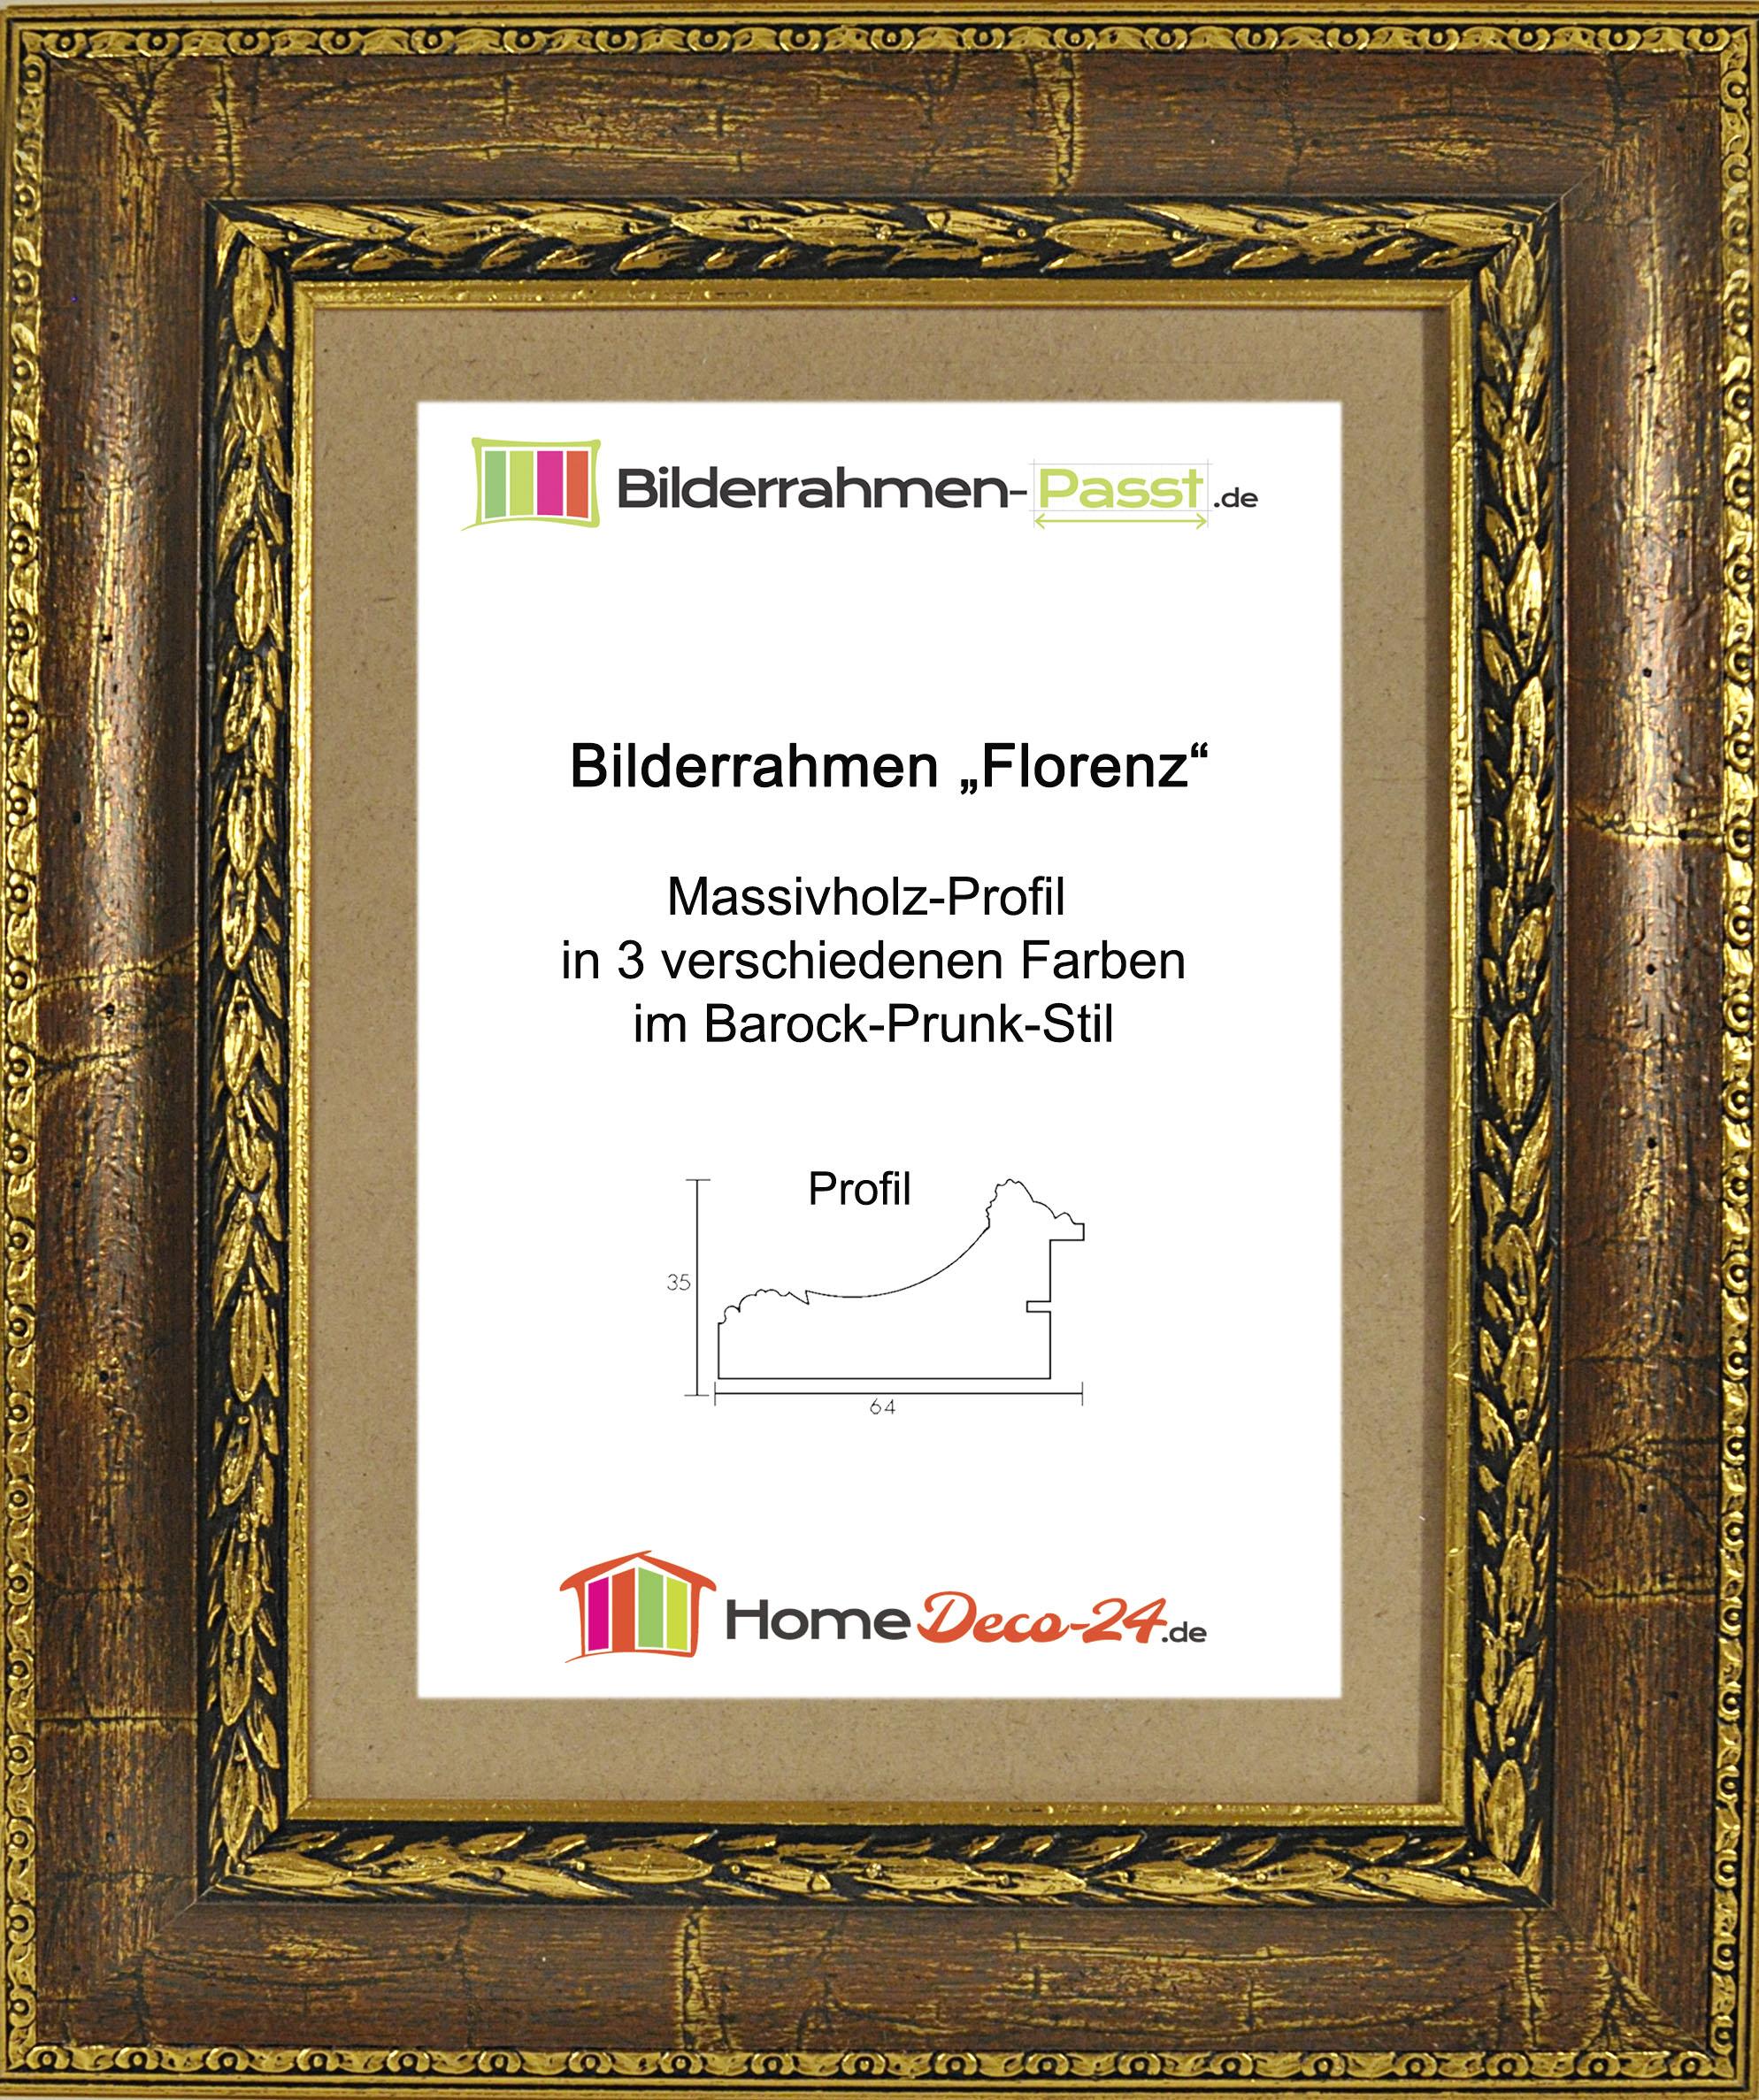 Massivholz bilderrahmen barock prunk 45x69 cm florenz for Home deco 24